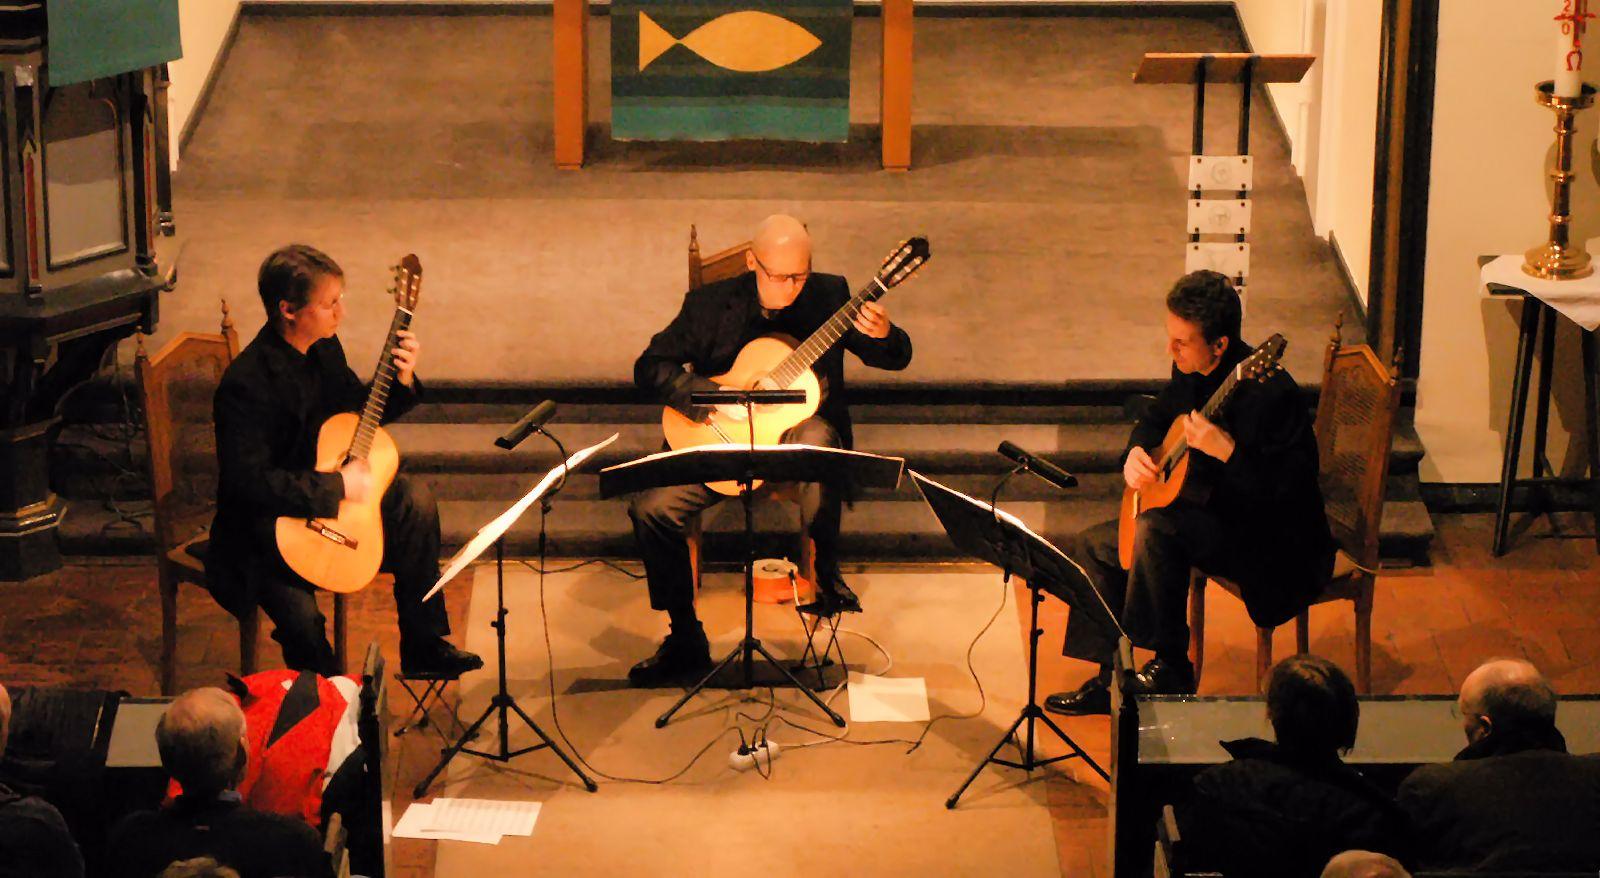 Bremer Gitarrentrio - Frank Ahrens, Oliver Eidam, Jürgen Lenga